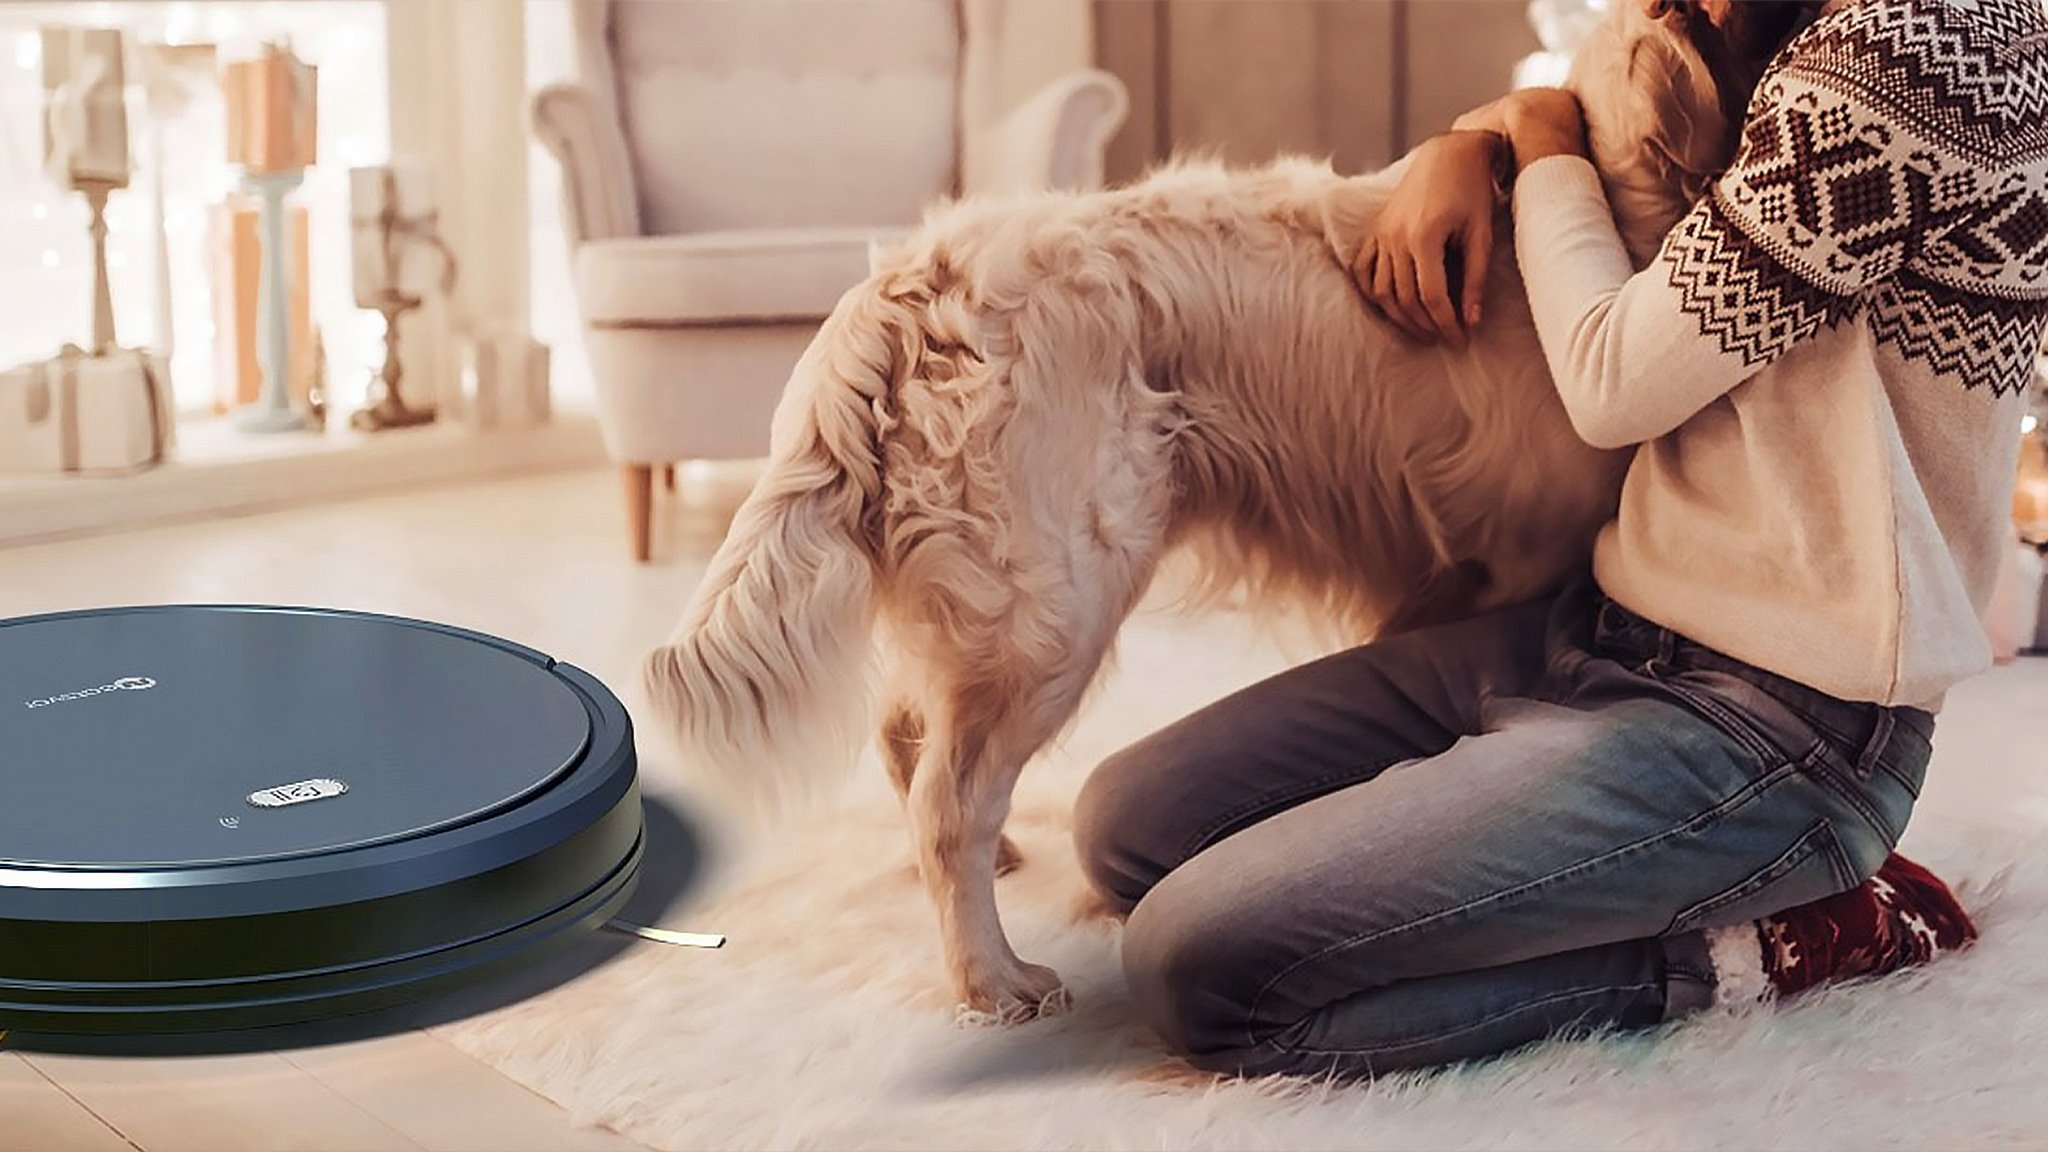 X520 med hund og menneske